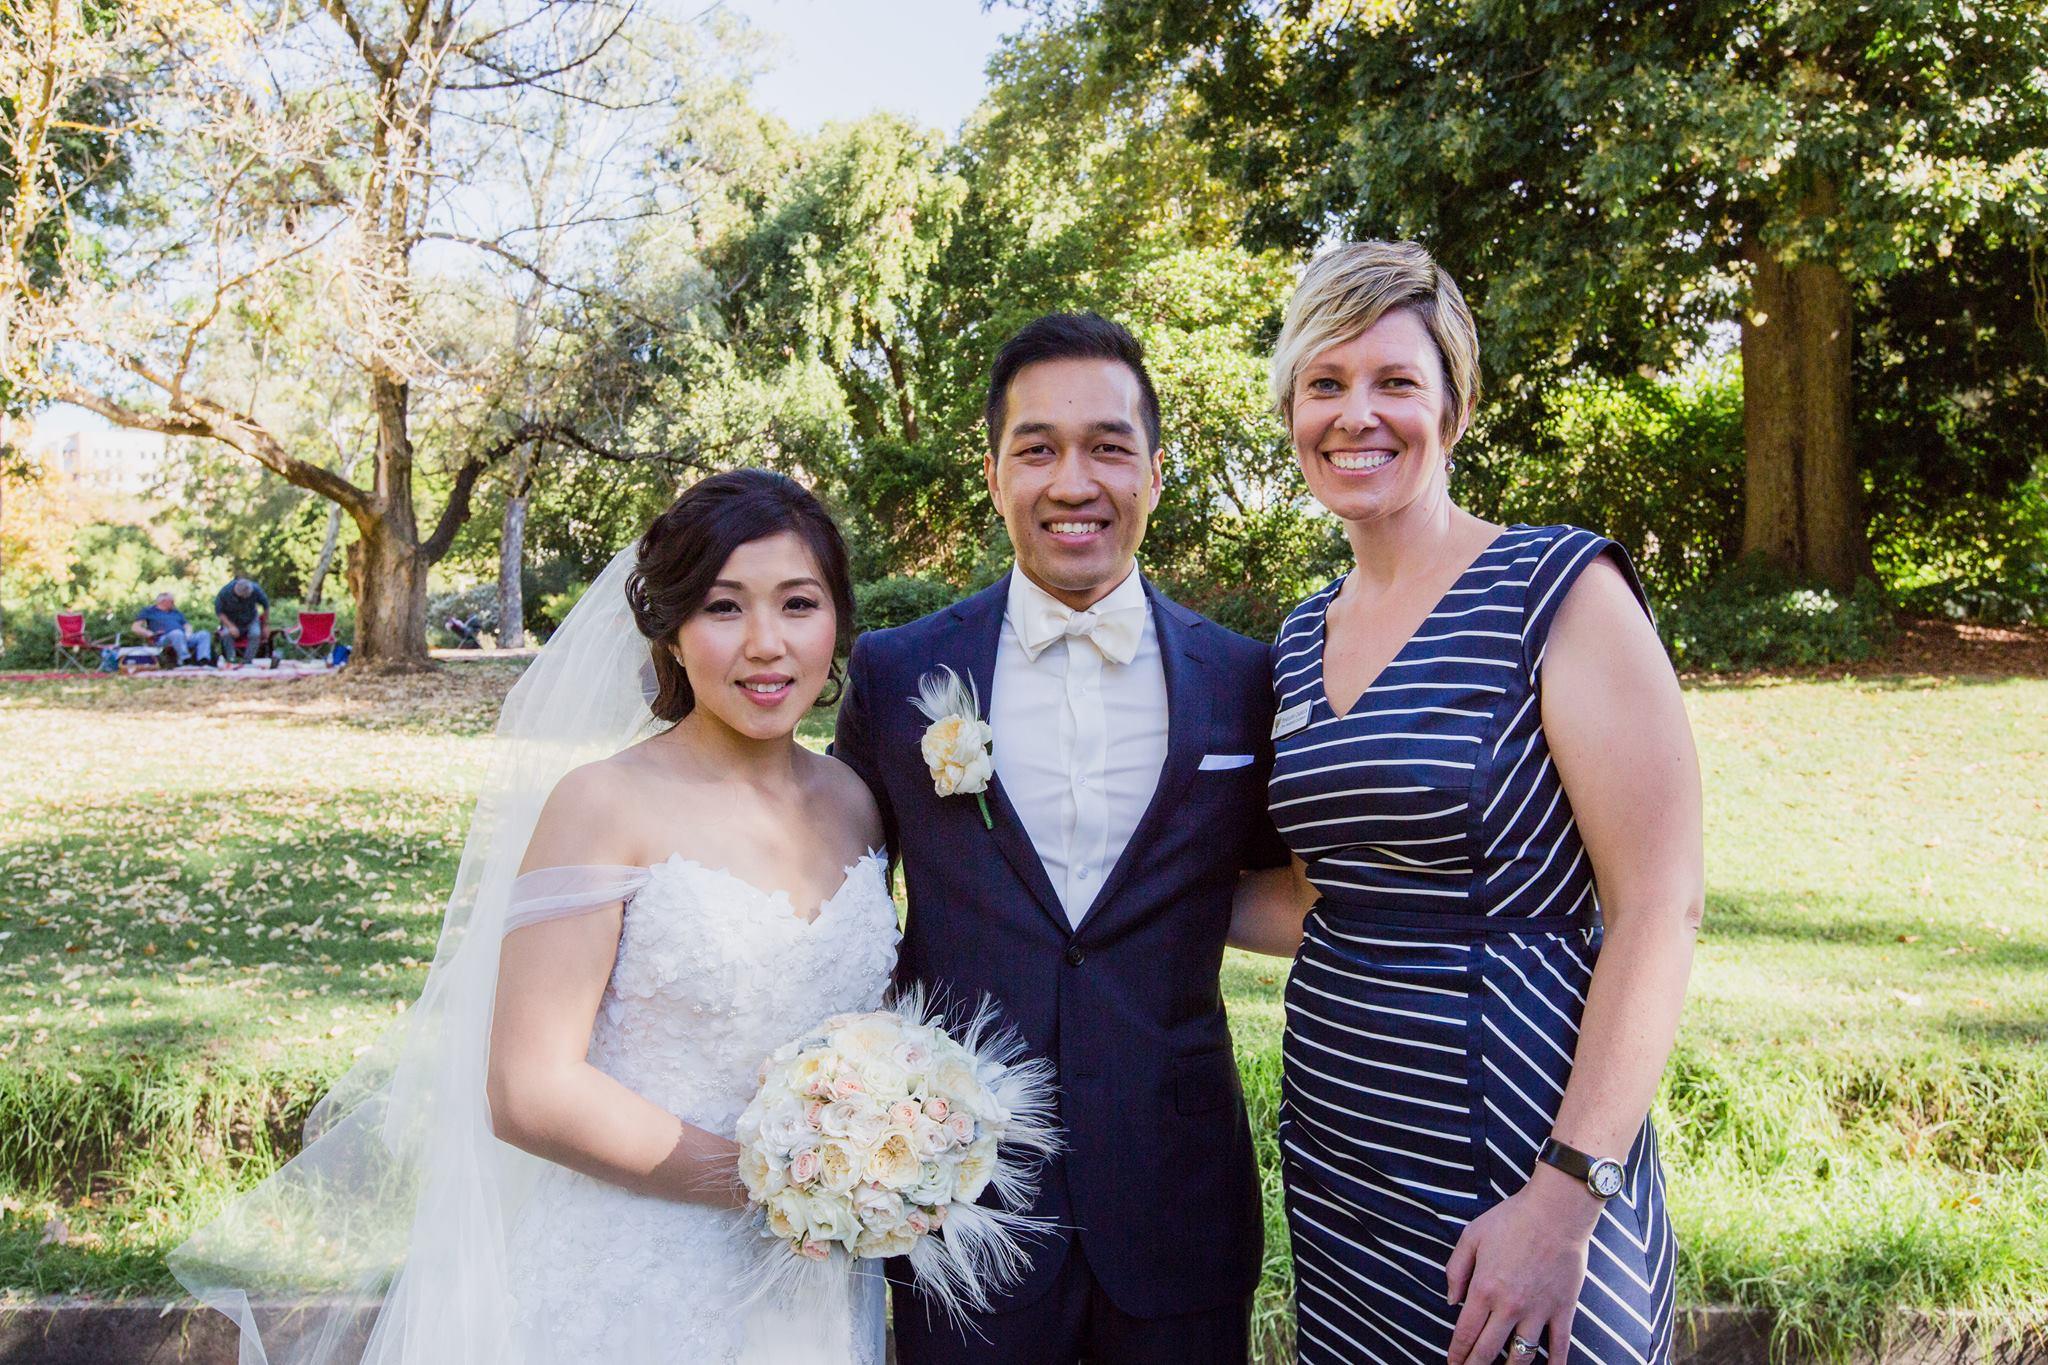 Adelaide Celebrant, Adelaide weddings, Adelaide wedding celebrant, Adelaide Hills weddings, Adelaide wedding photographer